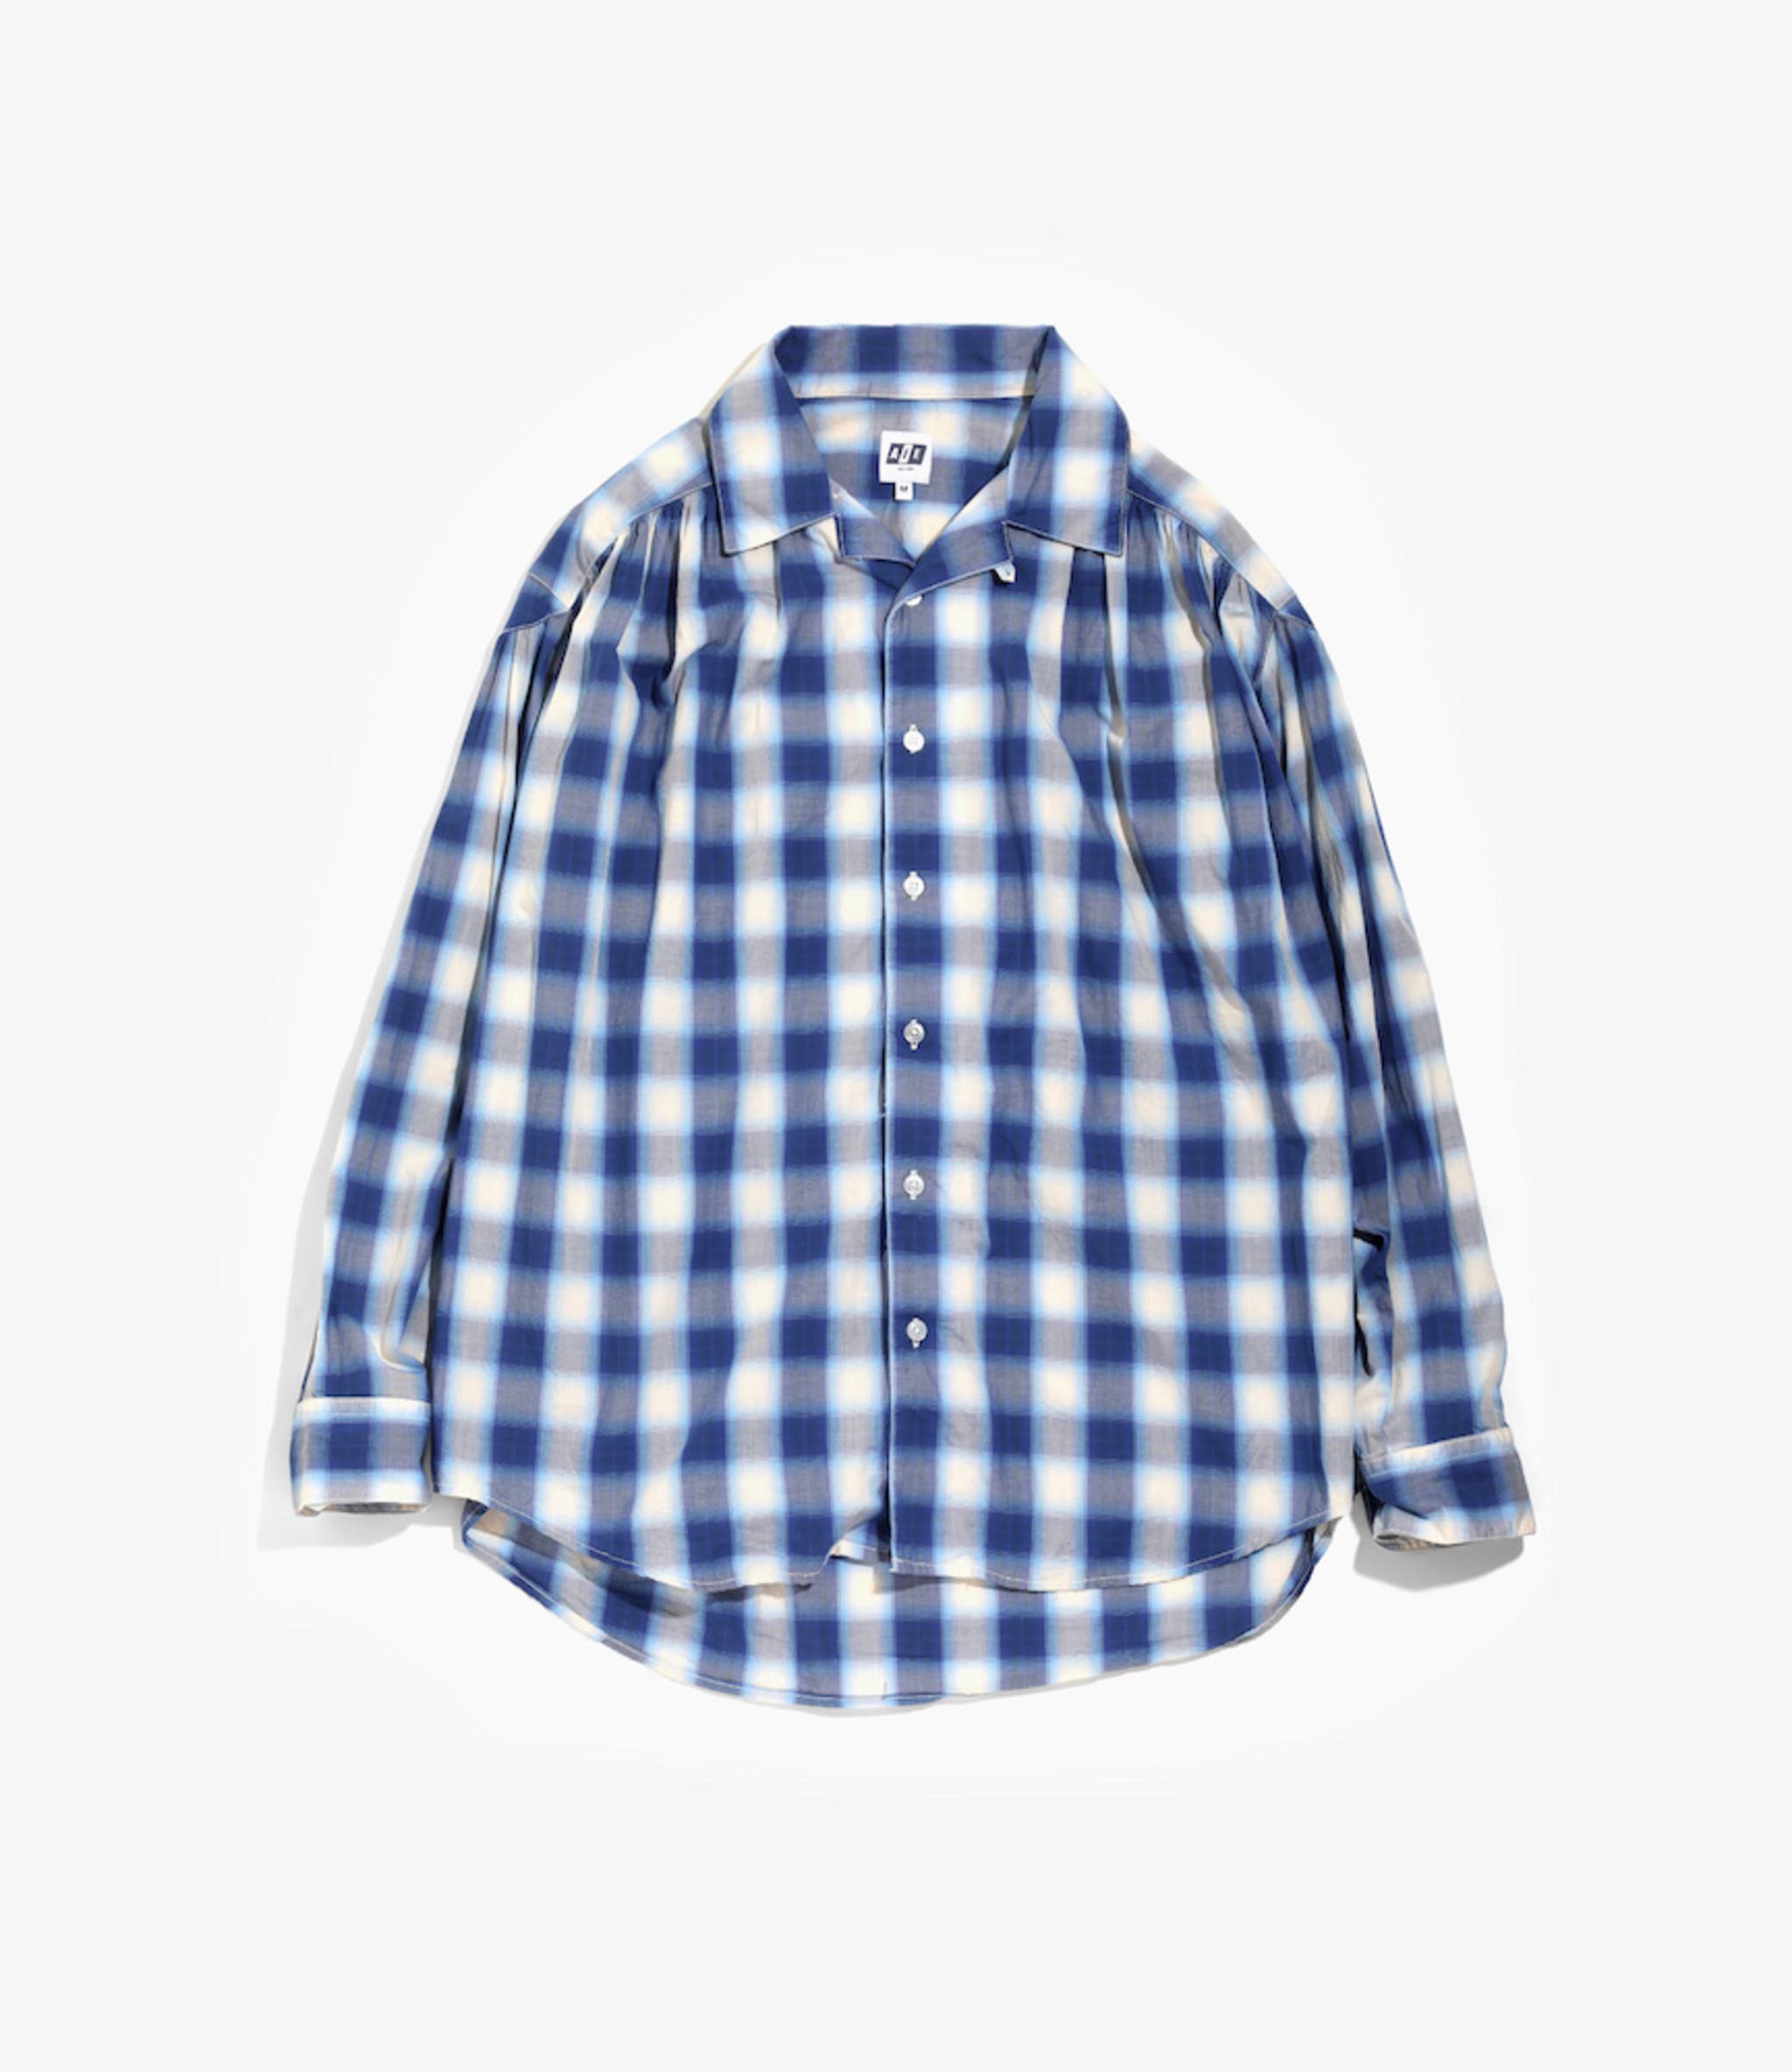 AïE Painter Shirt - Navy White Cotton Shadow Plaid